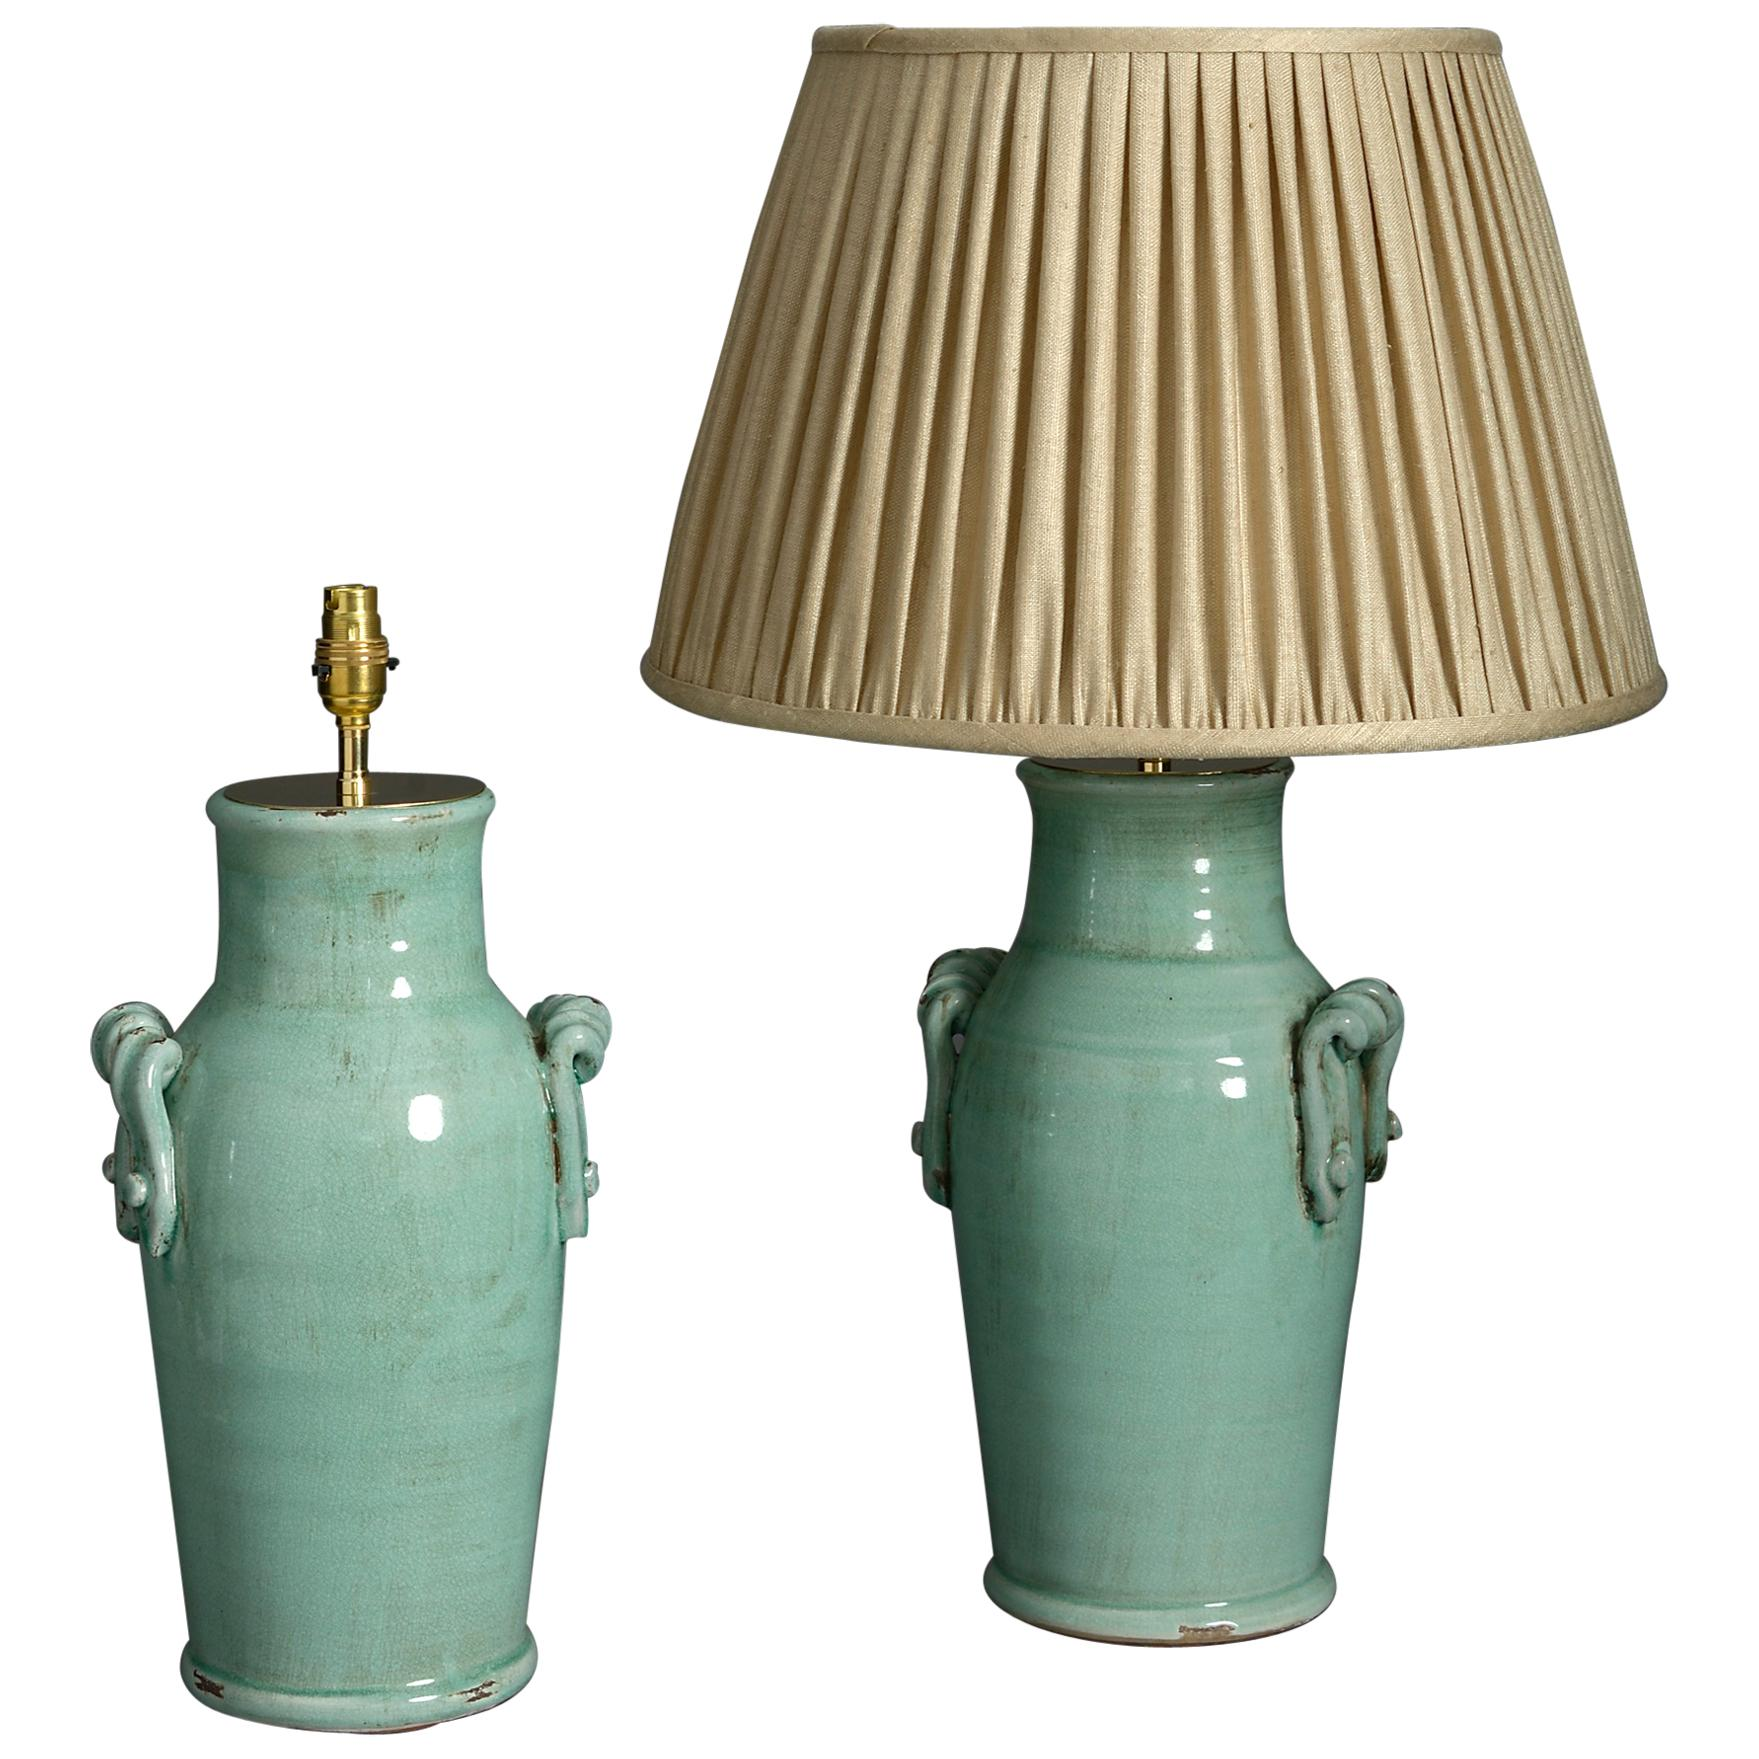 Pair of Celadon Green Crackle Glaze Vase Lamps